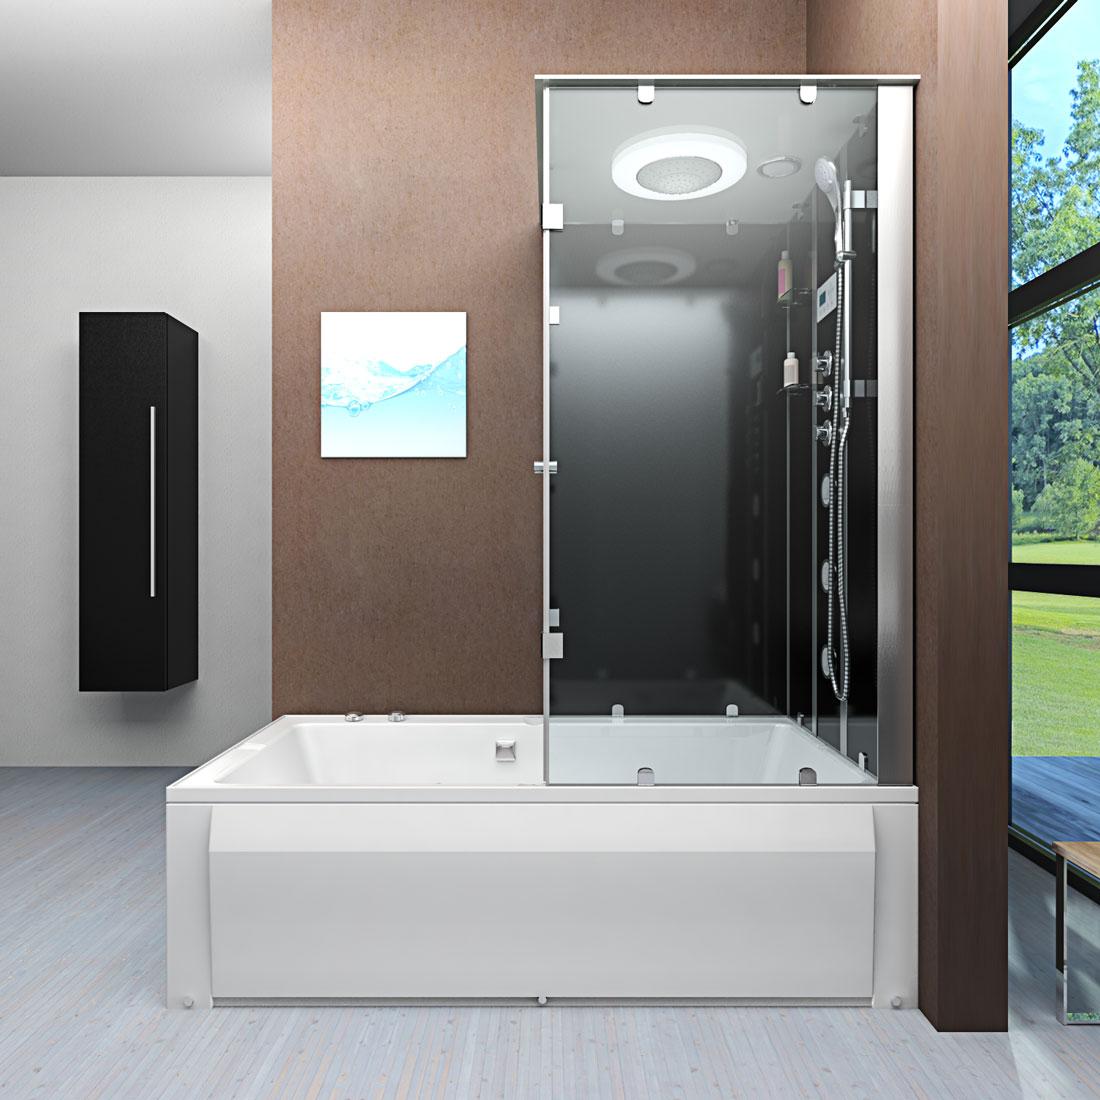 acquavapore dtp50 sw dusch wannen kombi in 180x90cm trendbad24. Black Bedroom Furniture Sets. Home Design Ideas